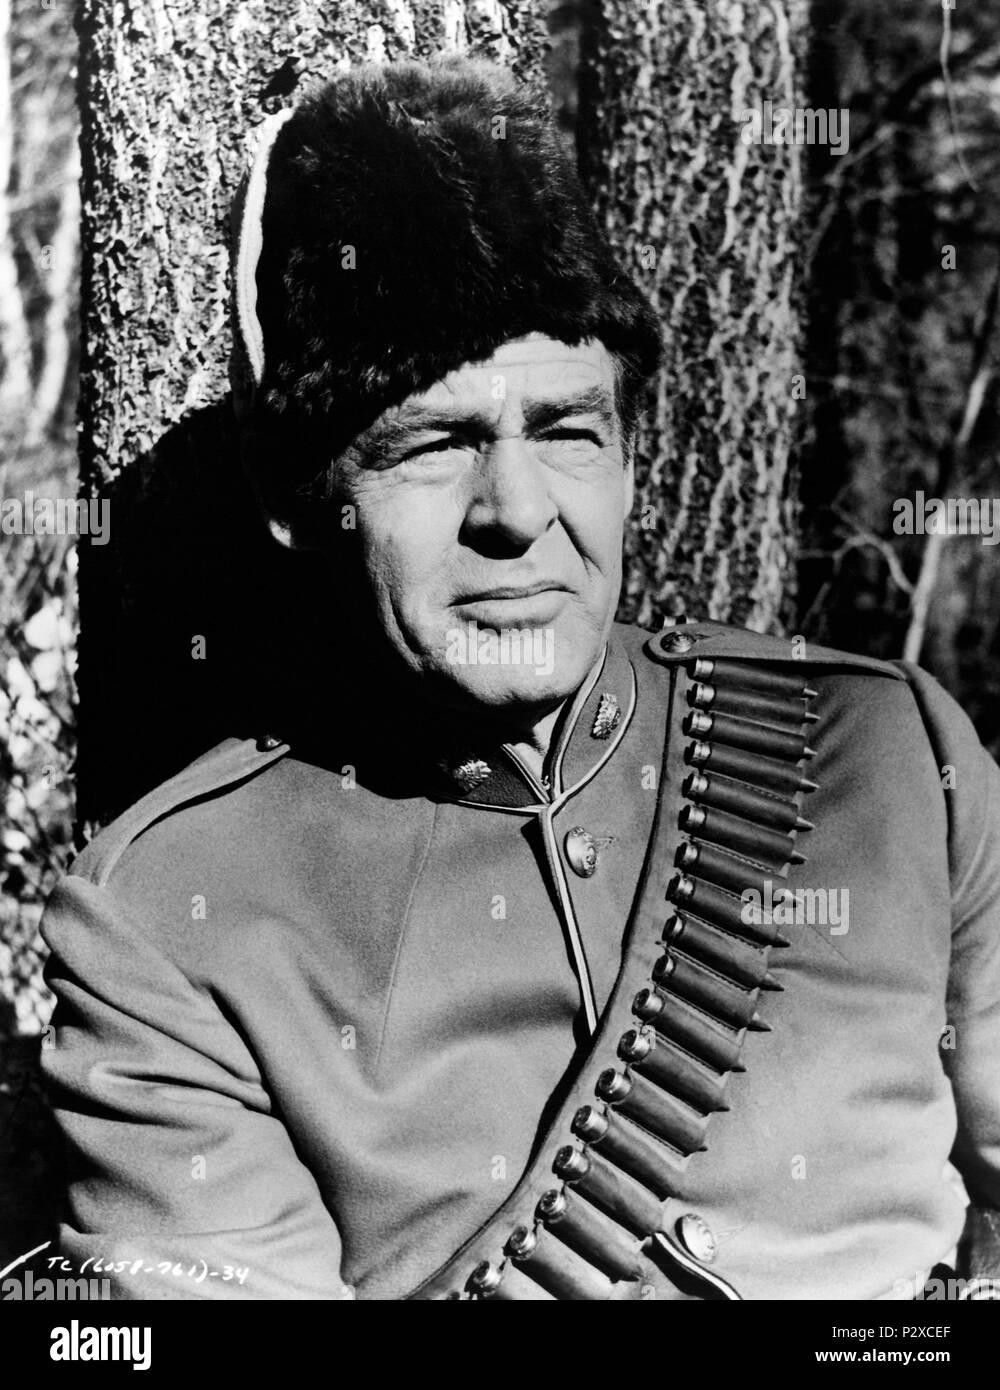 Original Film Title: THE CANADIANS.  English Title: THE CANADIANS.  Film Director: BURT KENNEDY.  Year: 1961.  Stars: ROBERT RYAN. Credit: 20TH CENTURY FOX / Album - Stock Image